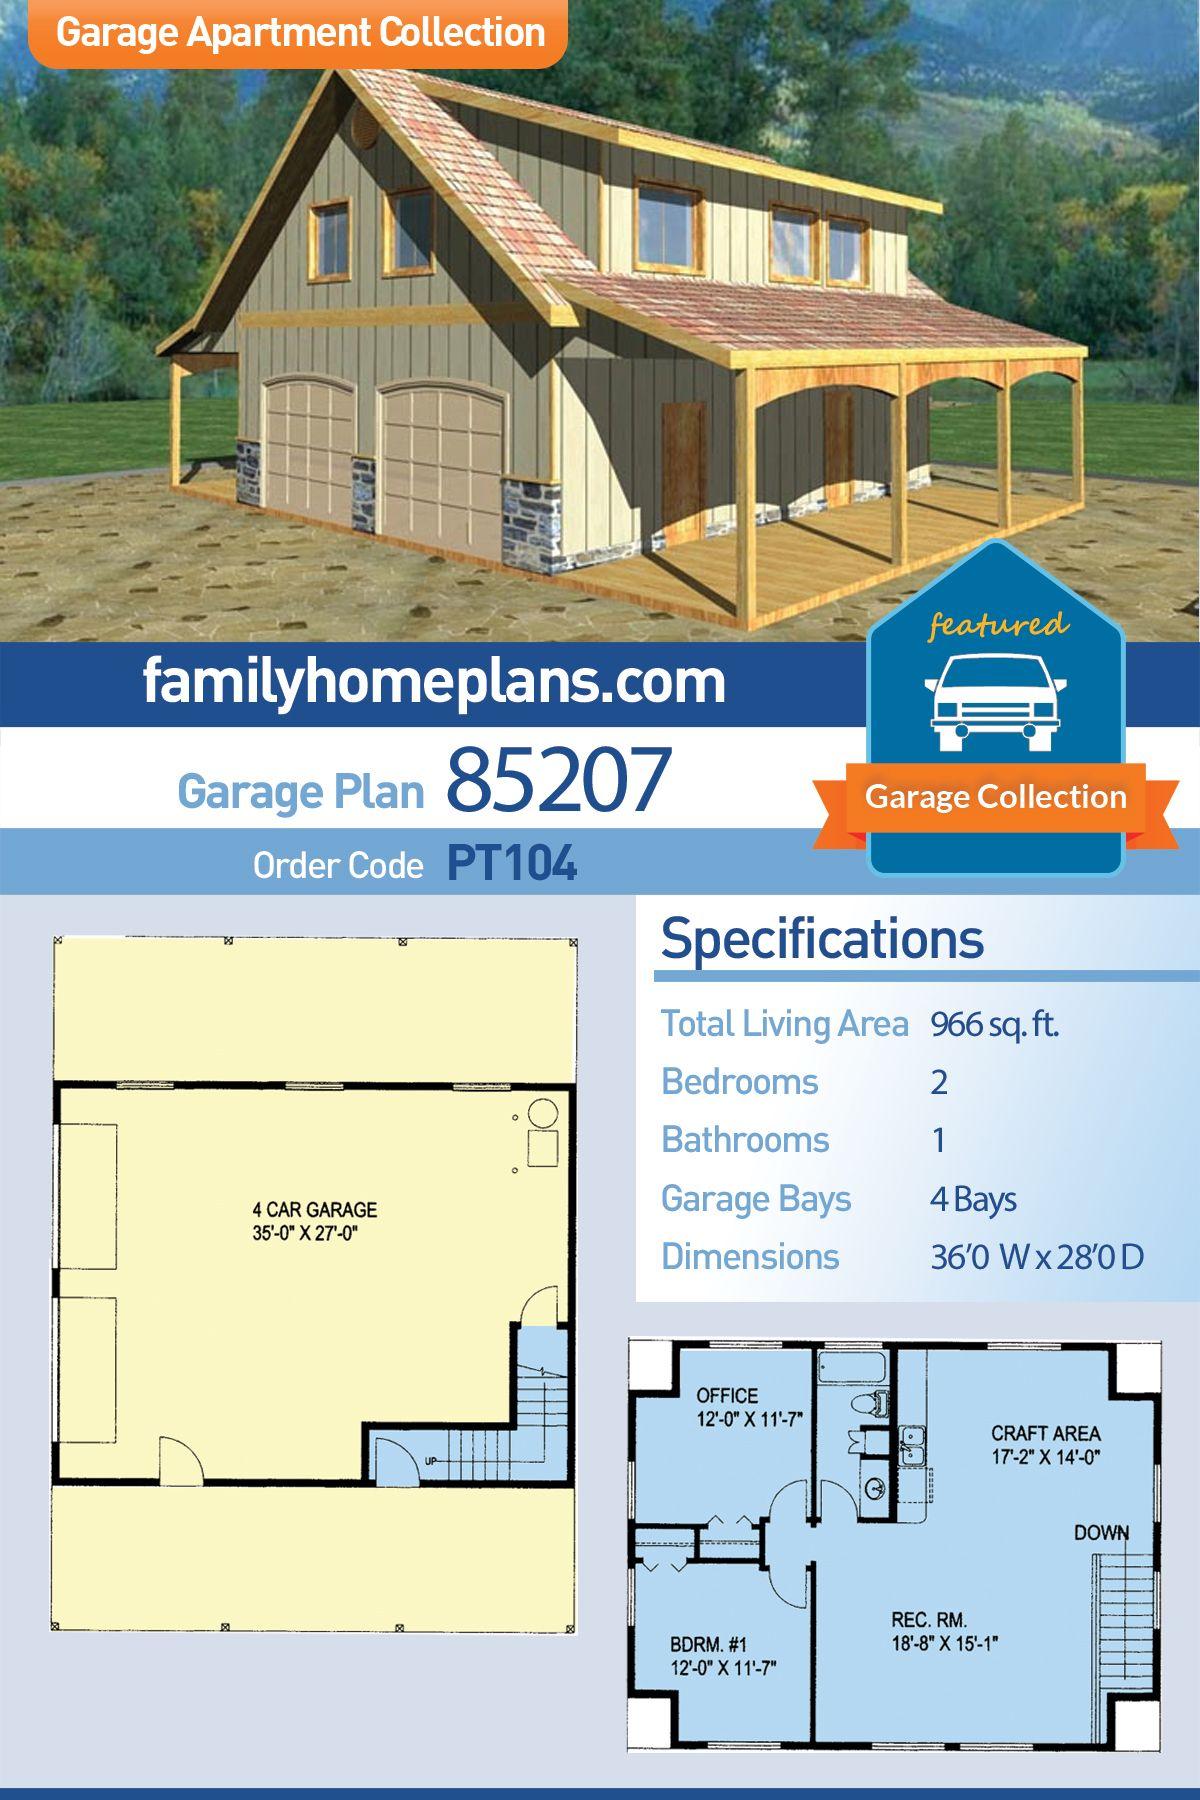 Southern Style 4 Car Garage Apartment Plan Number 85207 With 2 Bed 1 Bath Garage Apartment Plans Garage Apartment Plan Garage Apartments